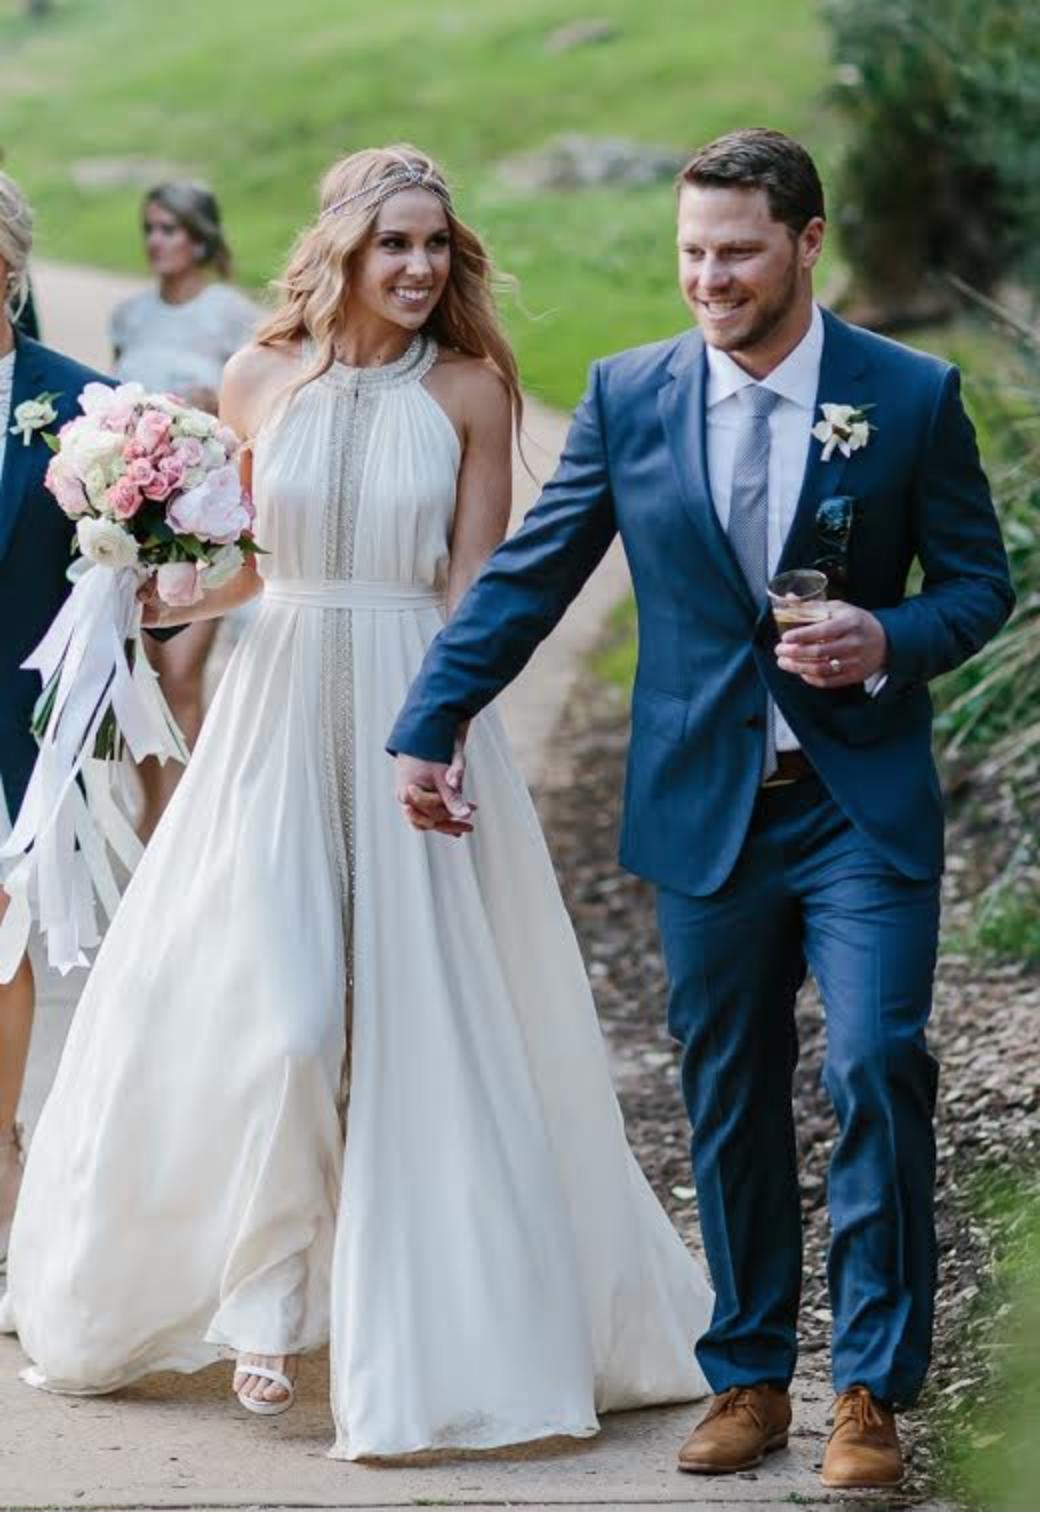 Stunning wedding gown by bo u luca stunning wedding gowns